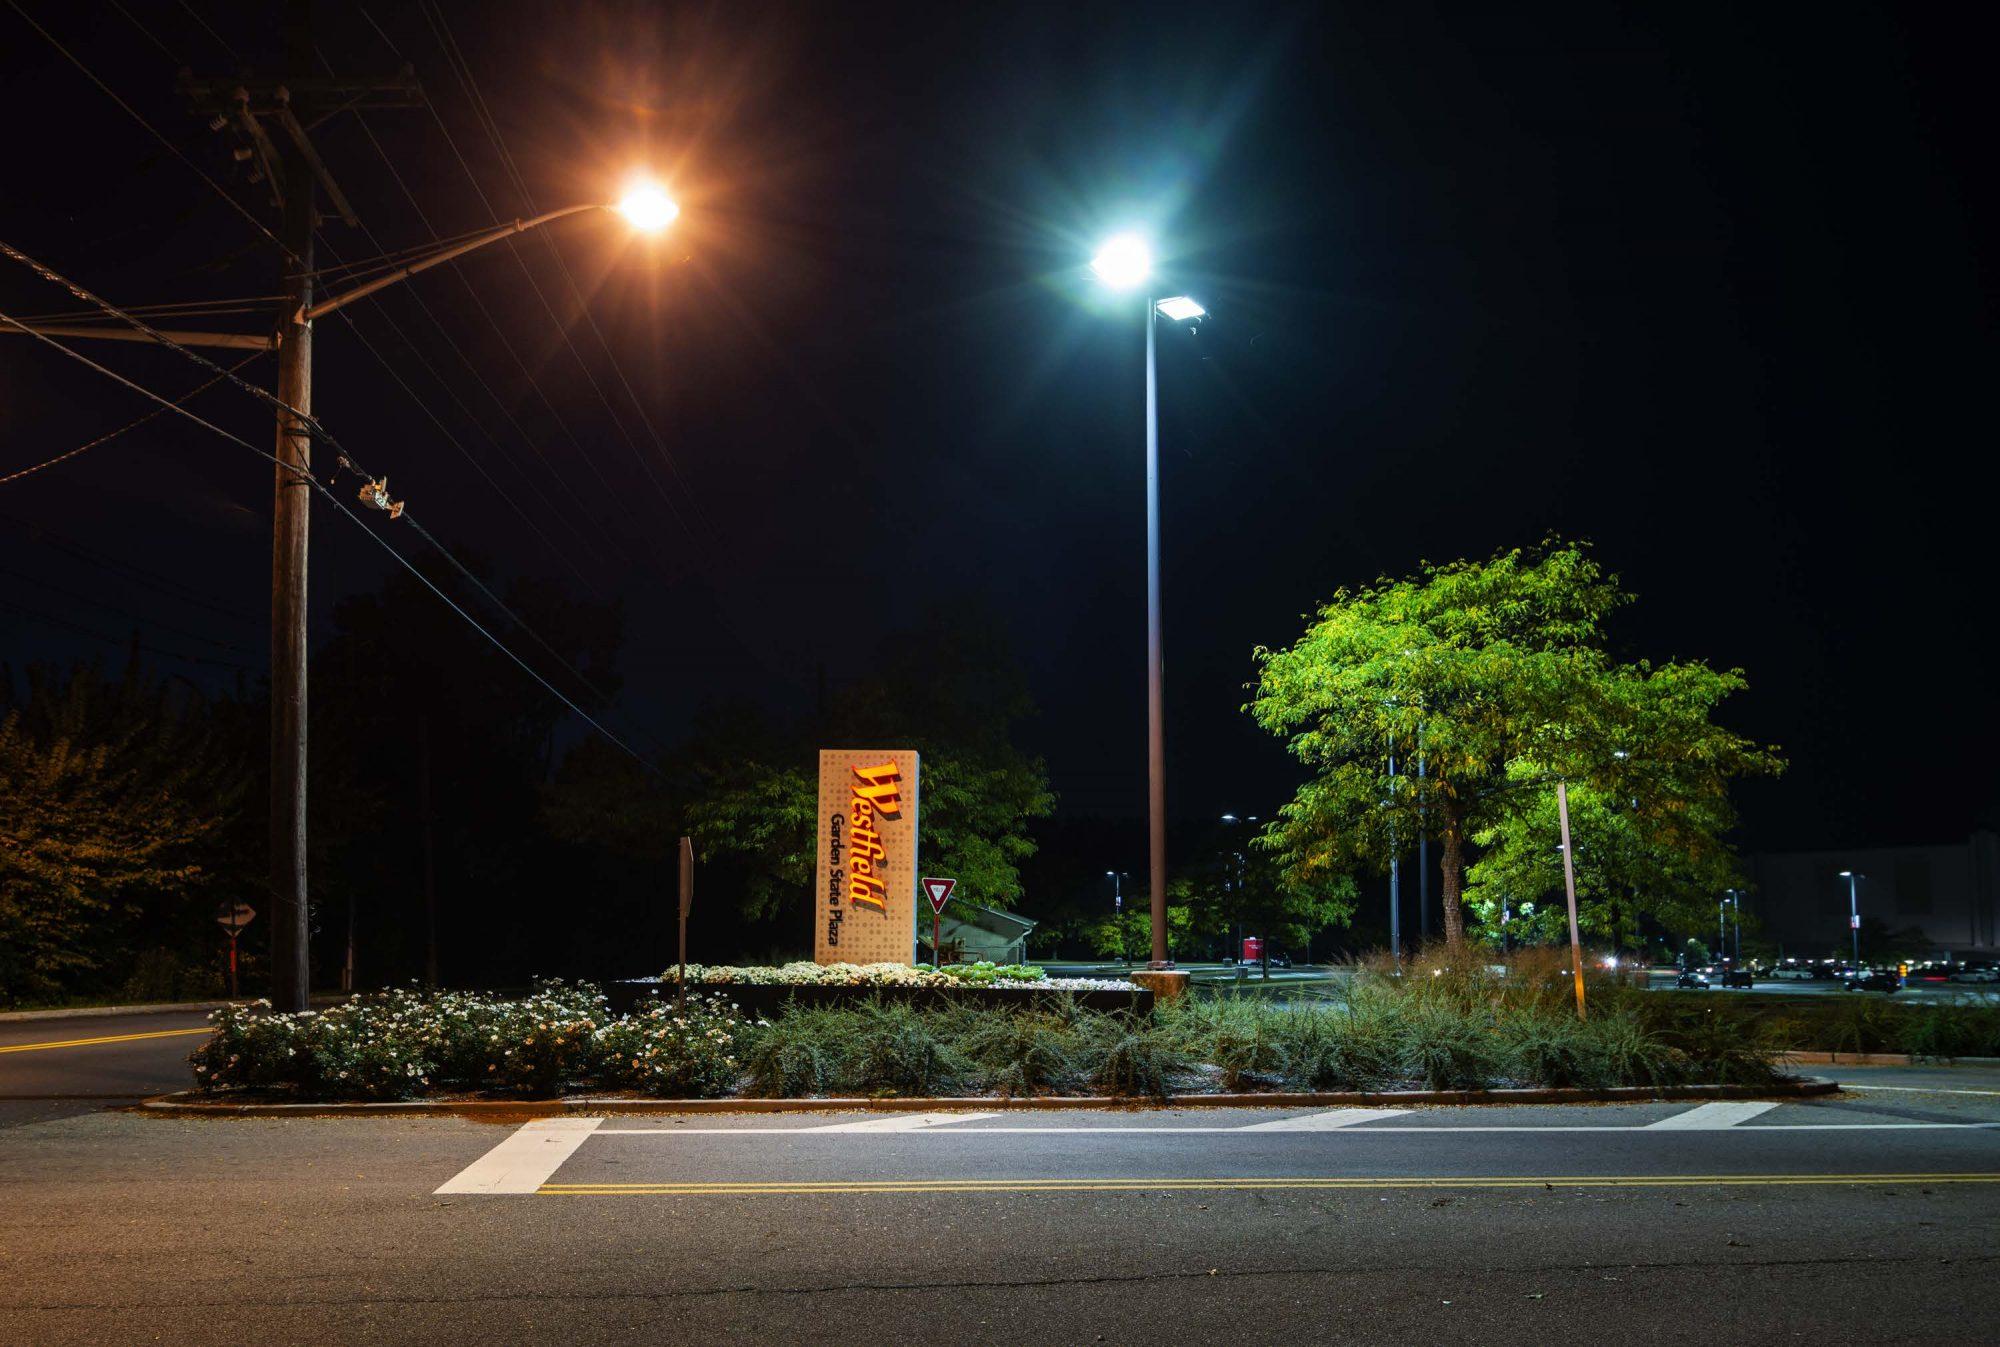 Garden State Plaza Flagship Landscape Project Image